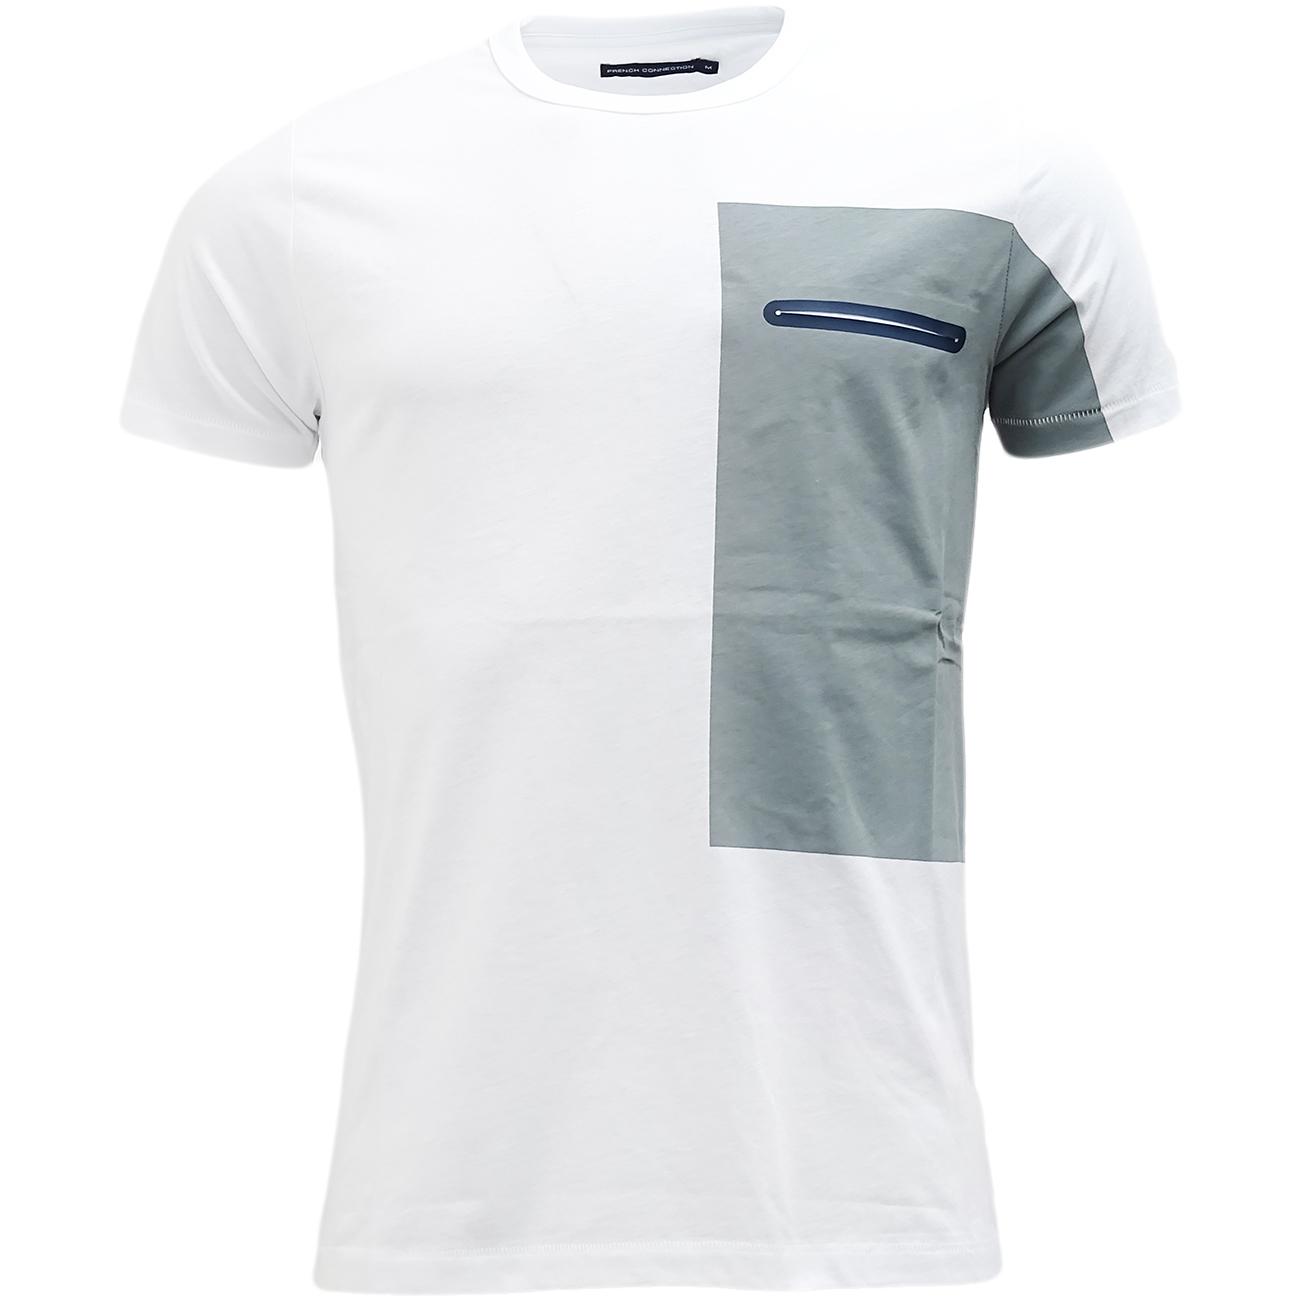 FCUK White Slim Fit T Shirt - 56GBA